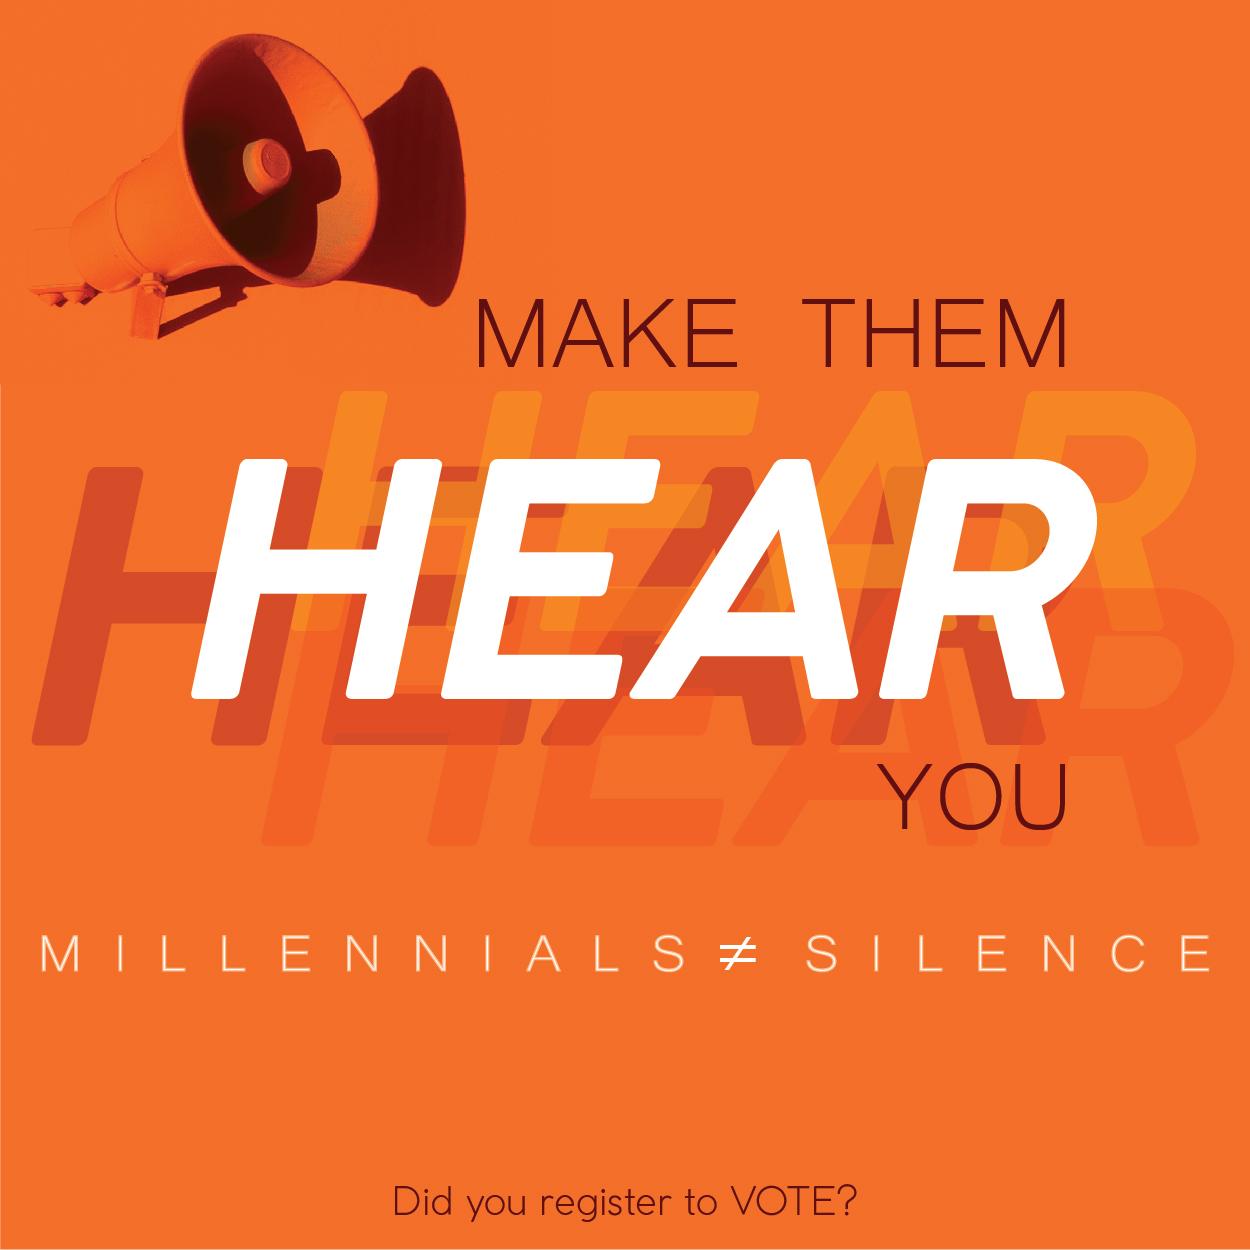 Vote! Make them hear you